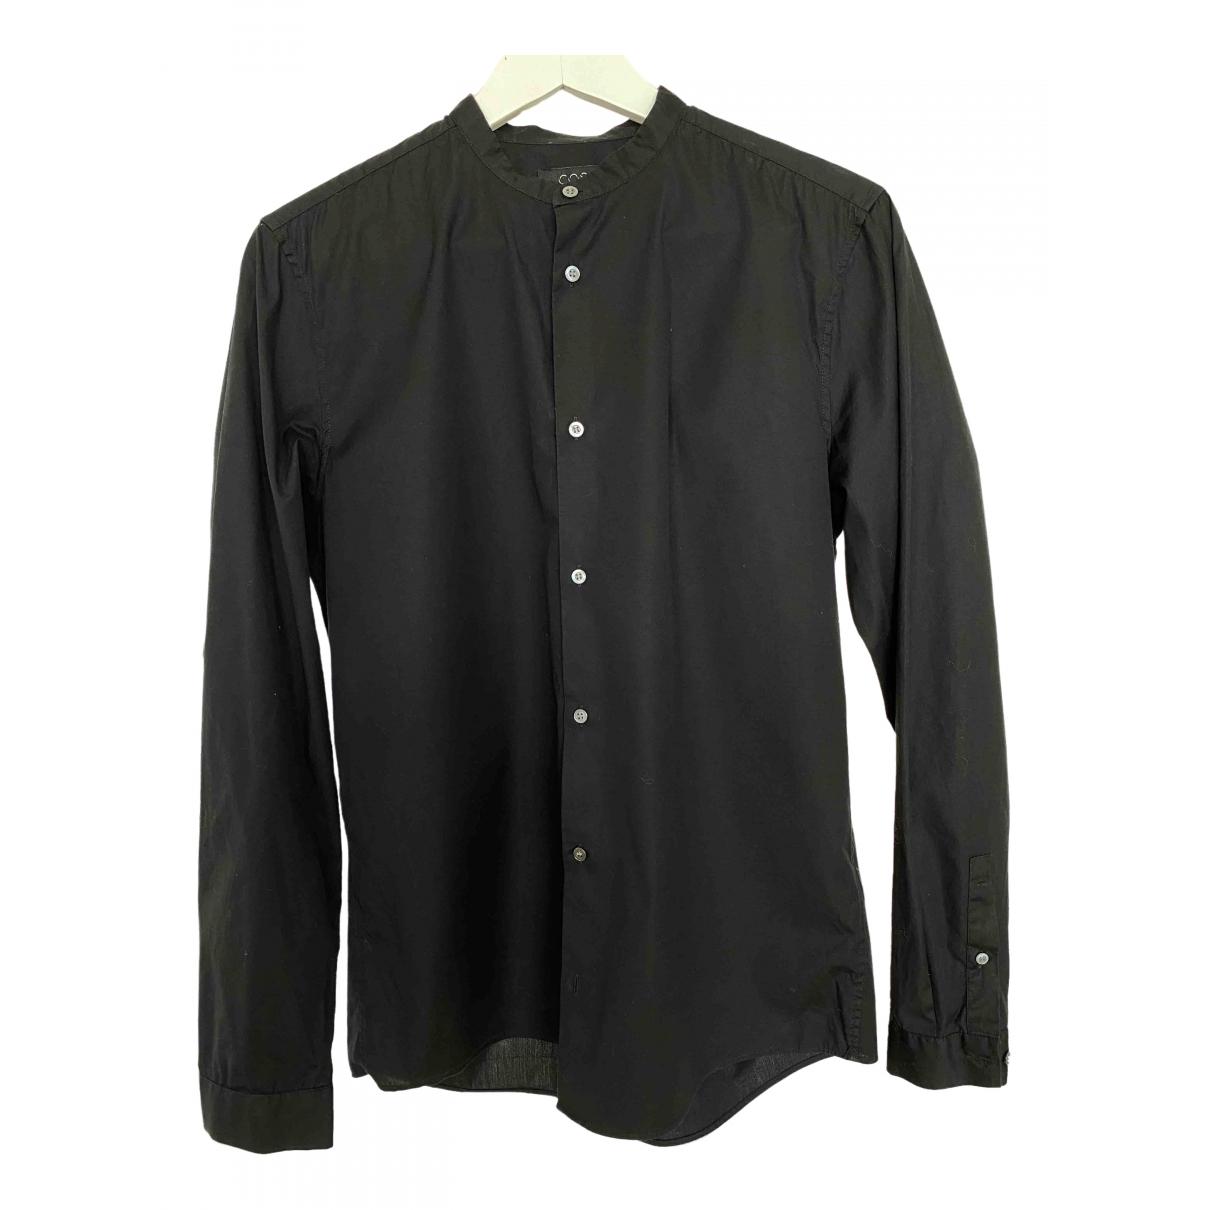 Cos \N Black Cotton Shirts for Men S International